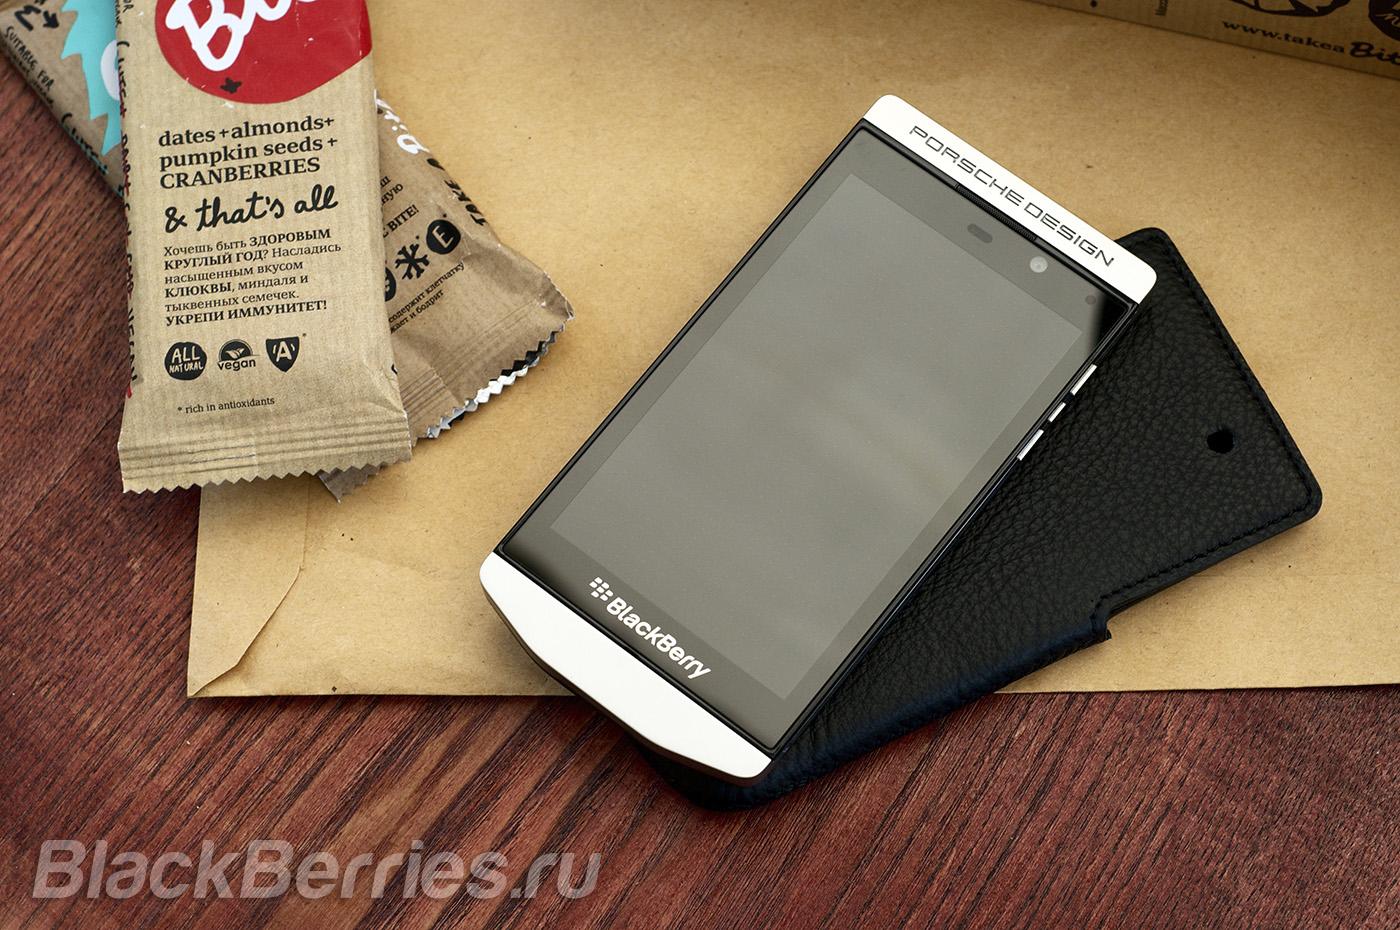 BlackBerry-P9982-Case-01